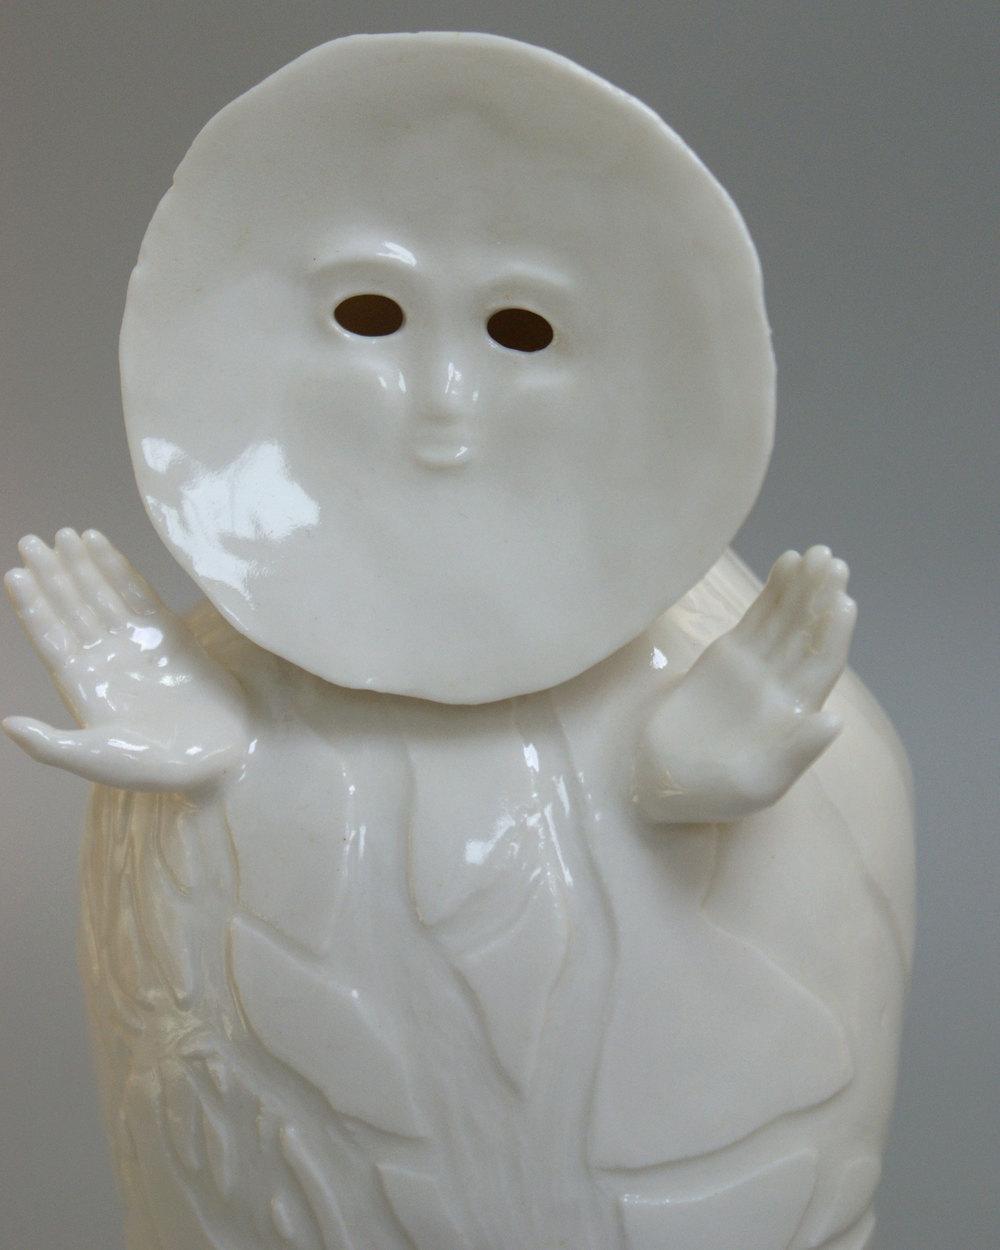 ceramic-artist-animals-mythical-bat.jpg